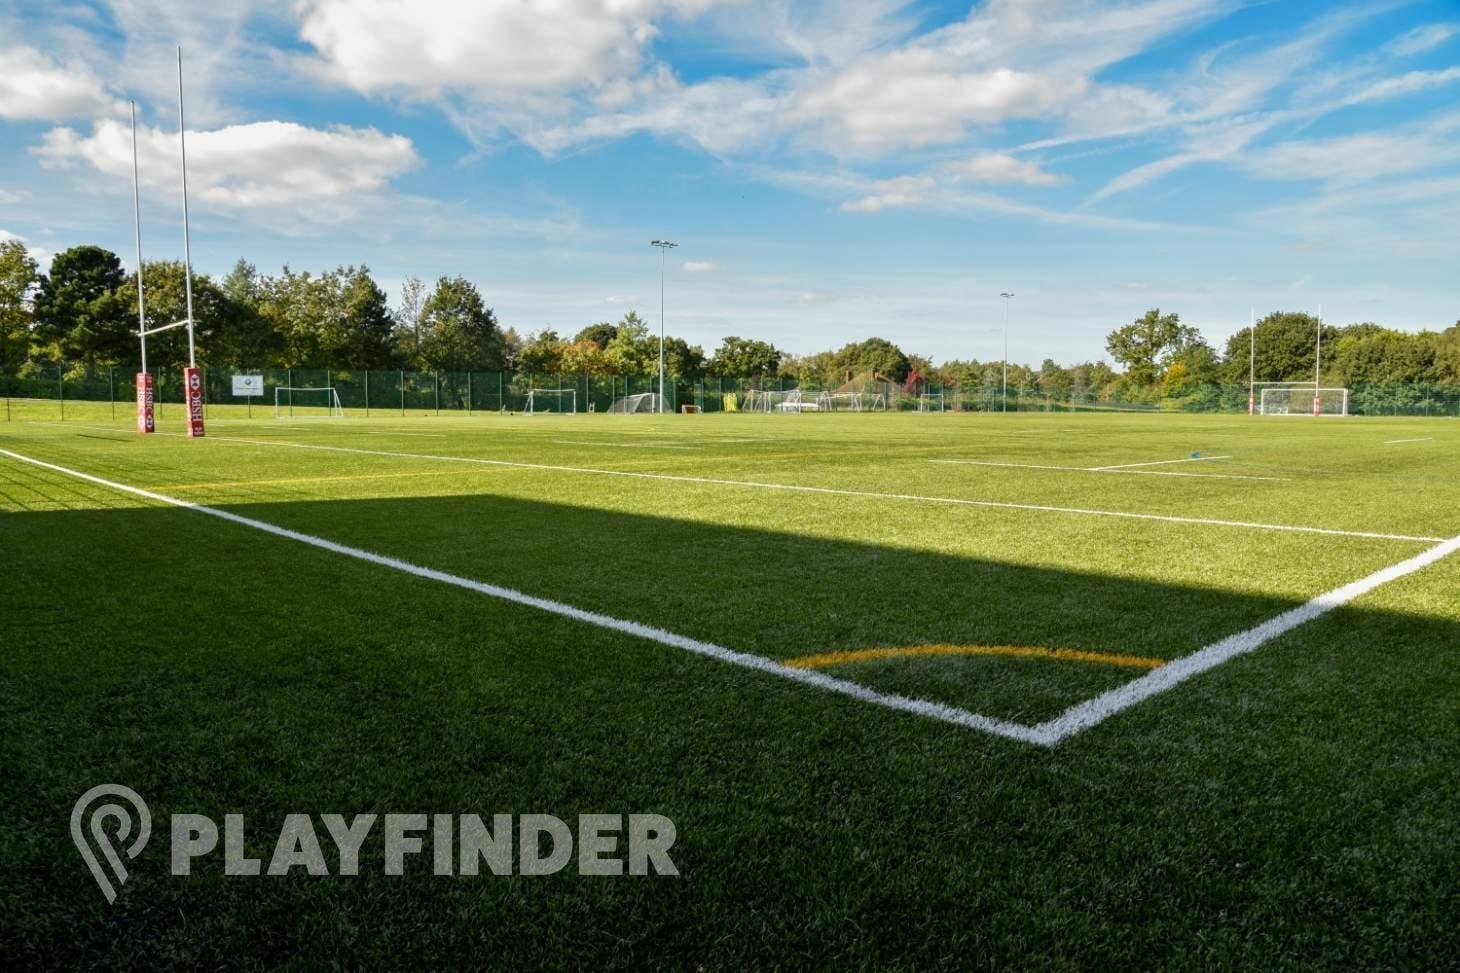 Ravens Wood School 11 a side | 3G Astroturf football pitch